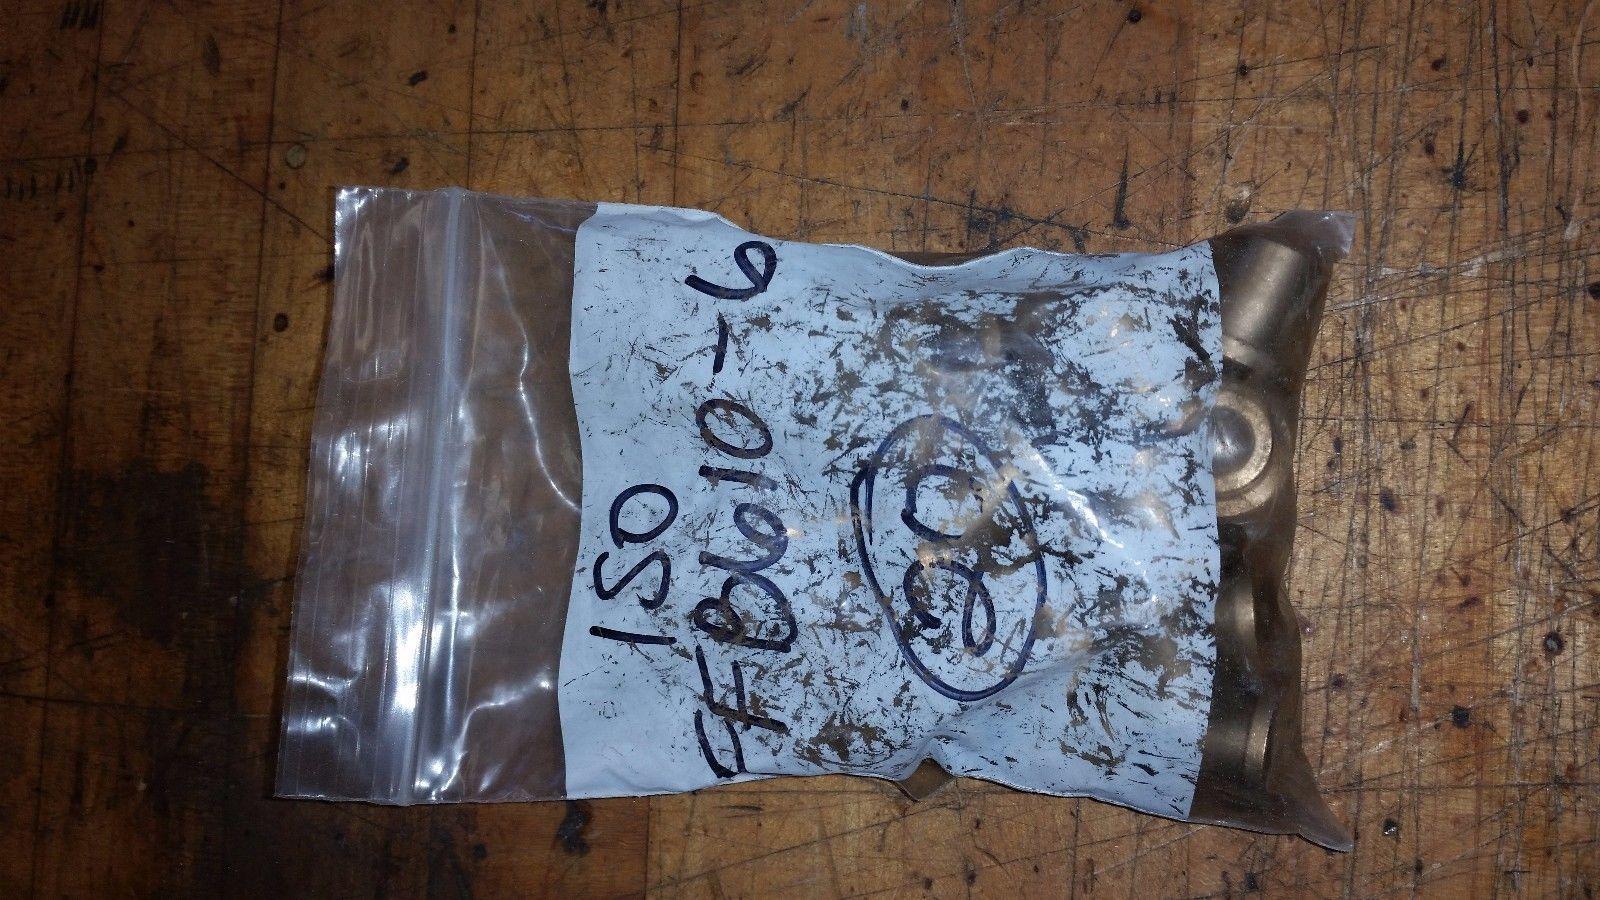 20 PC Oilite Flange Bushing Bronze 3/8 id x 5/8 od 3/4L Bush Shim Spacer Bearing